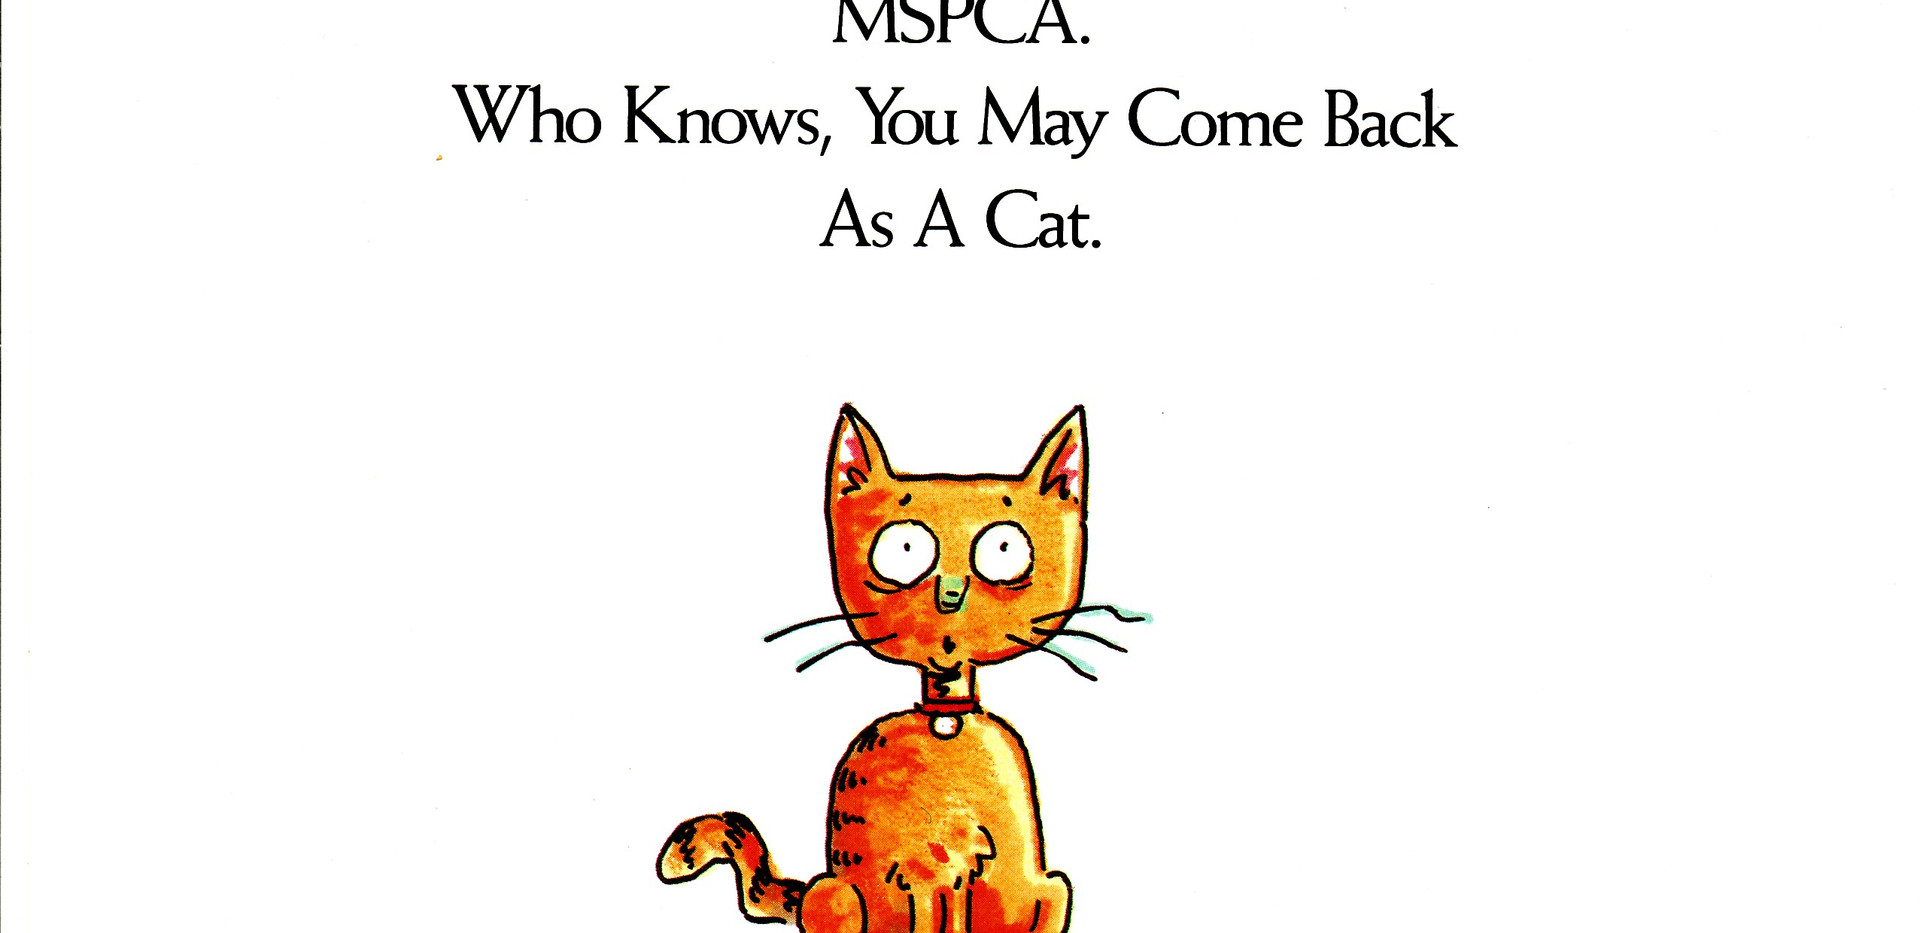 Ad campaign for the MSPCA in Boston